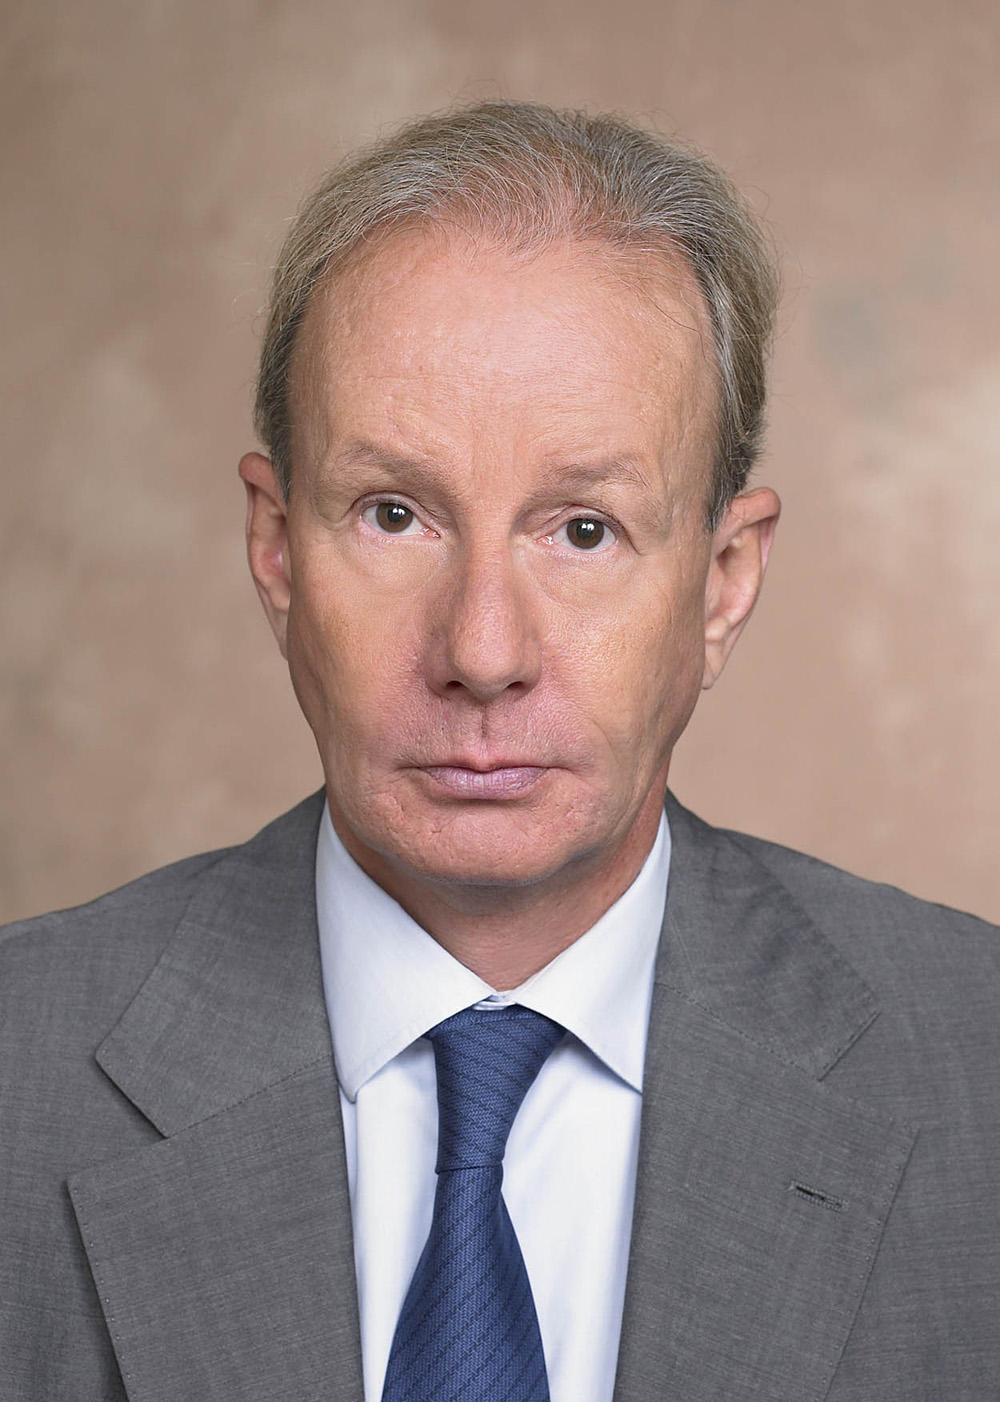 PrivatAir Inc.'s New CEO Napo Hohn to Boost U.S. Profits